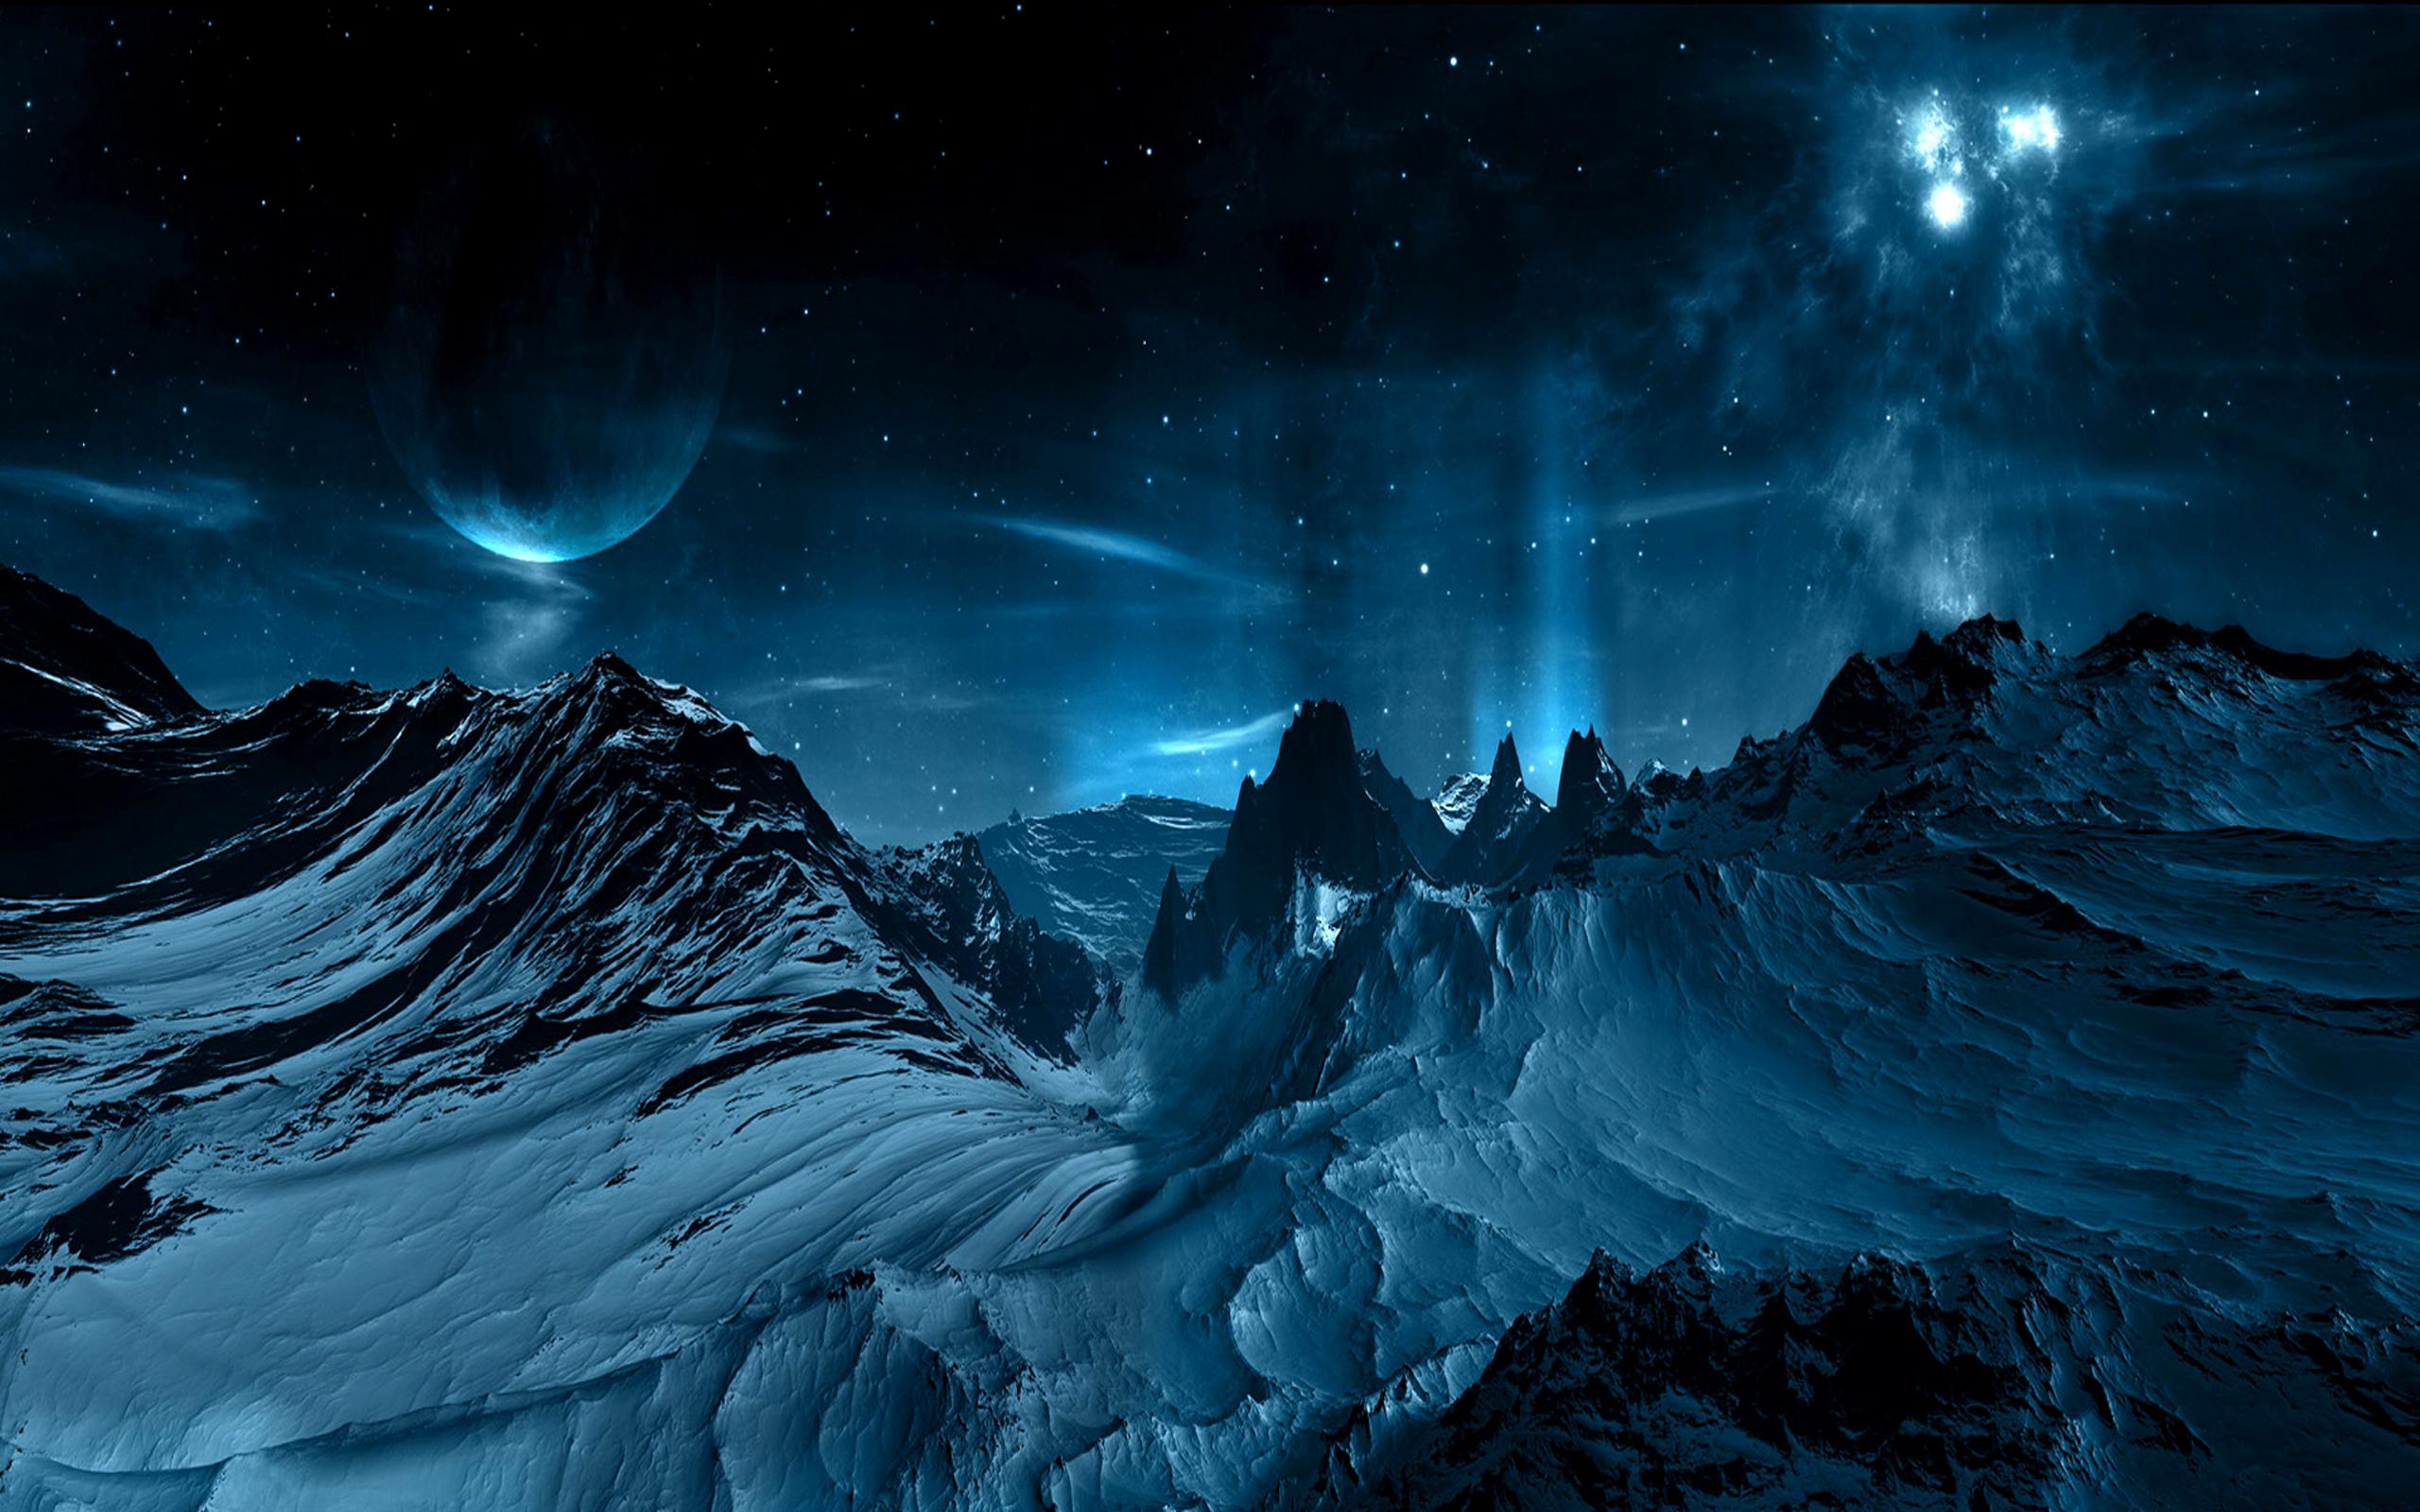 HD Wallpaper | Background ID:121806. 2560x1600 Sci Fi Landscape